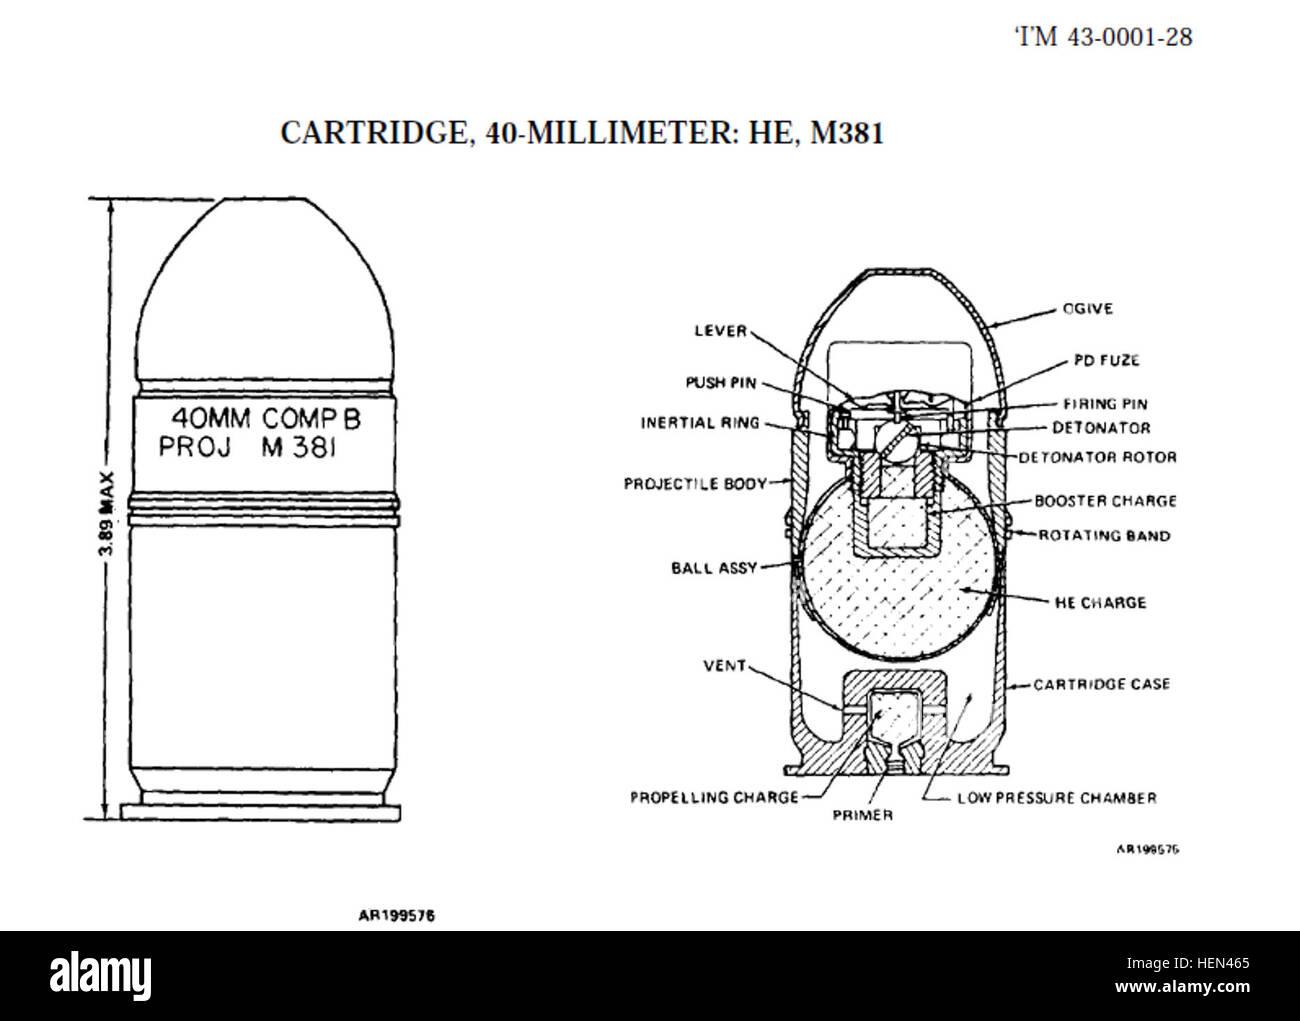 40mm grenade Stock Photo: 129542061 - Alamy